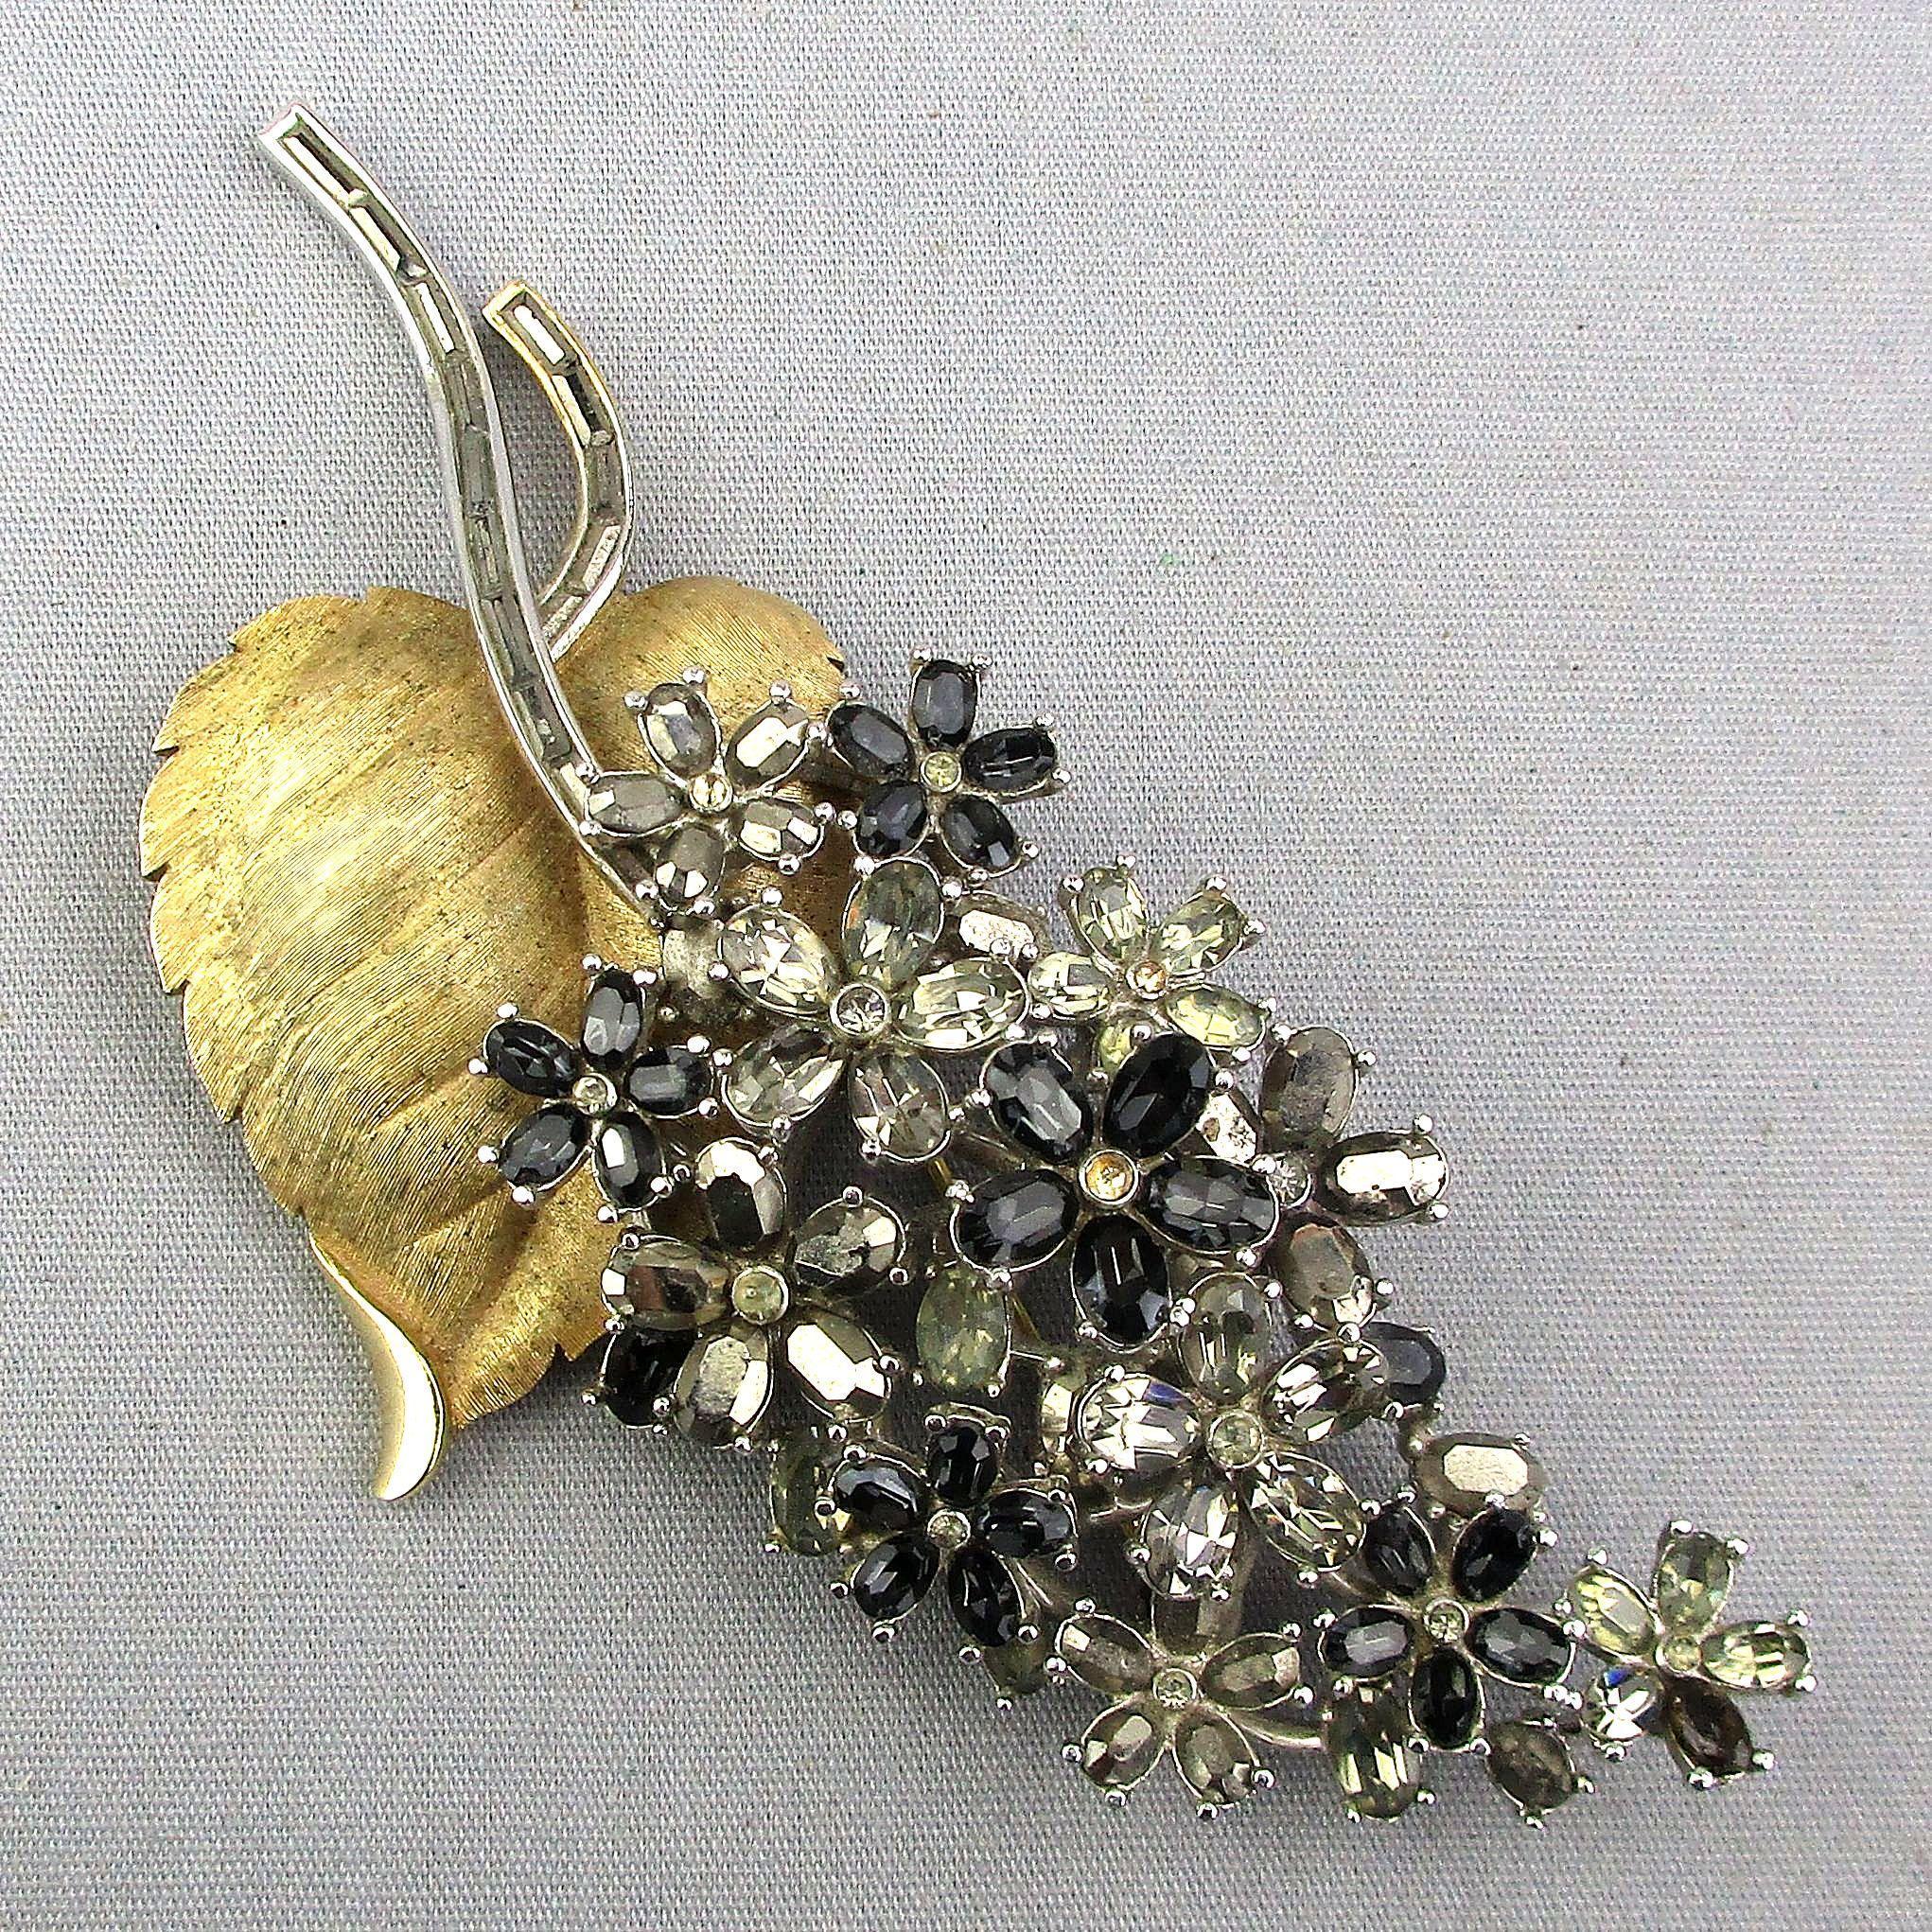 Crown Trifari Big Rhinestone Flower Pin 4 Inch Beauty